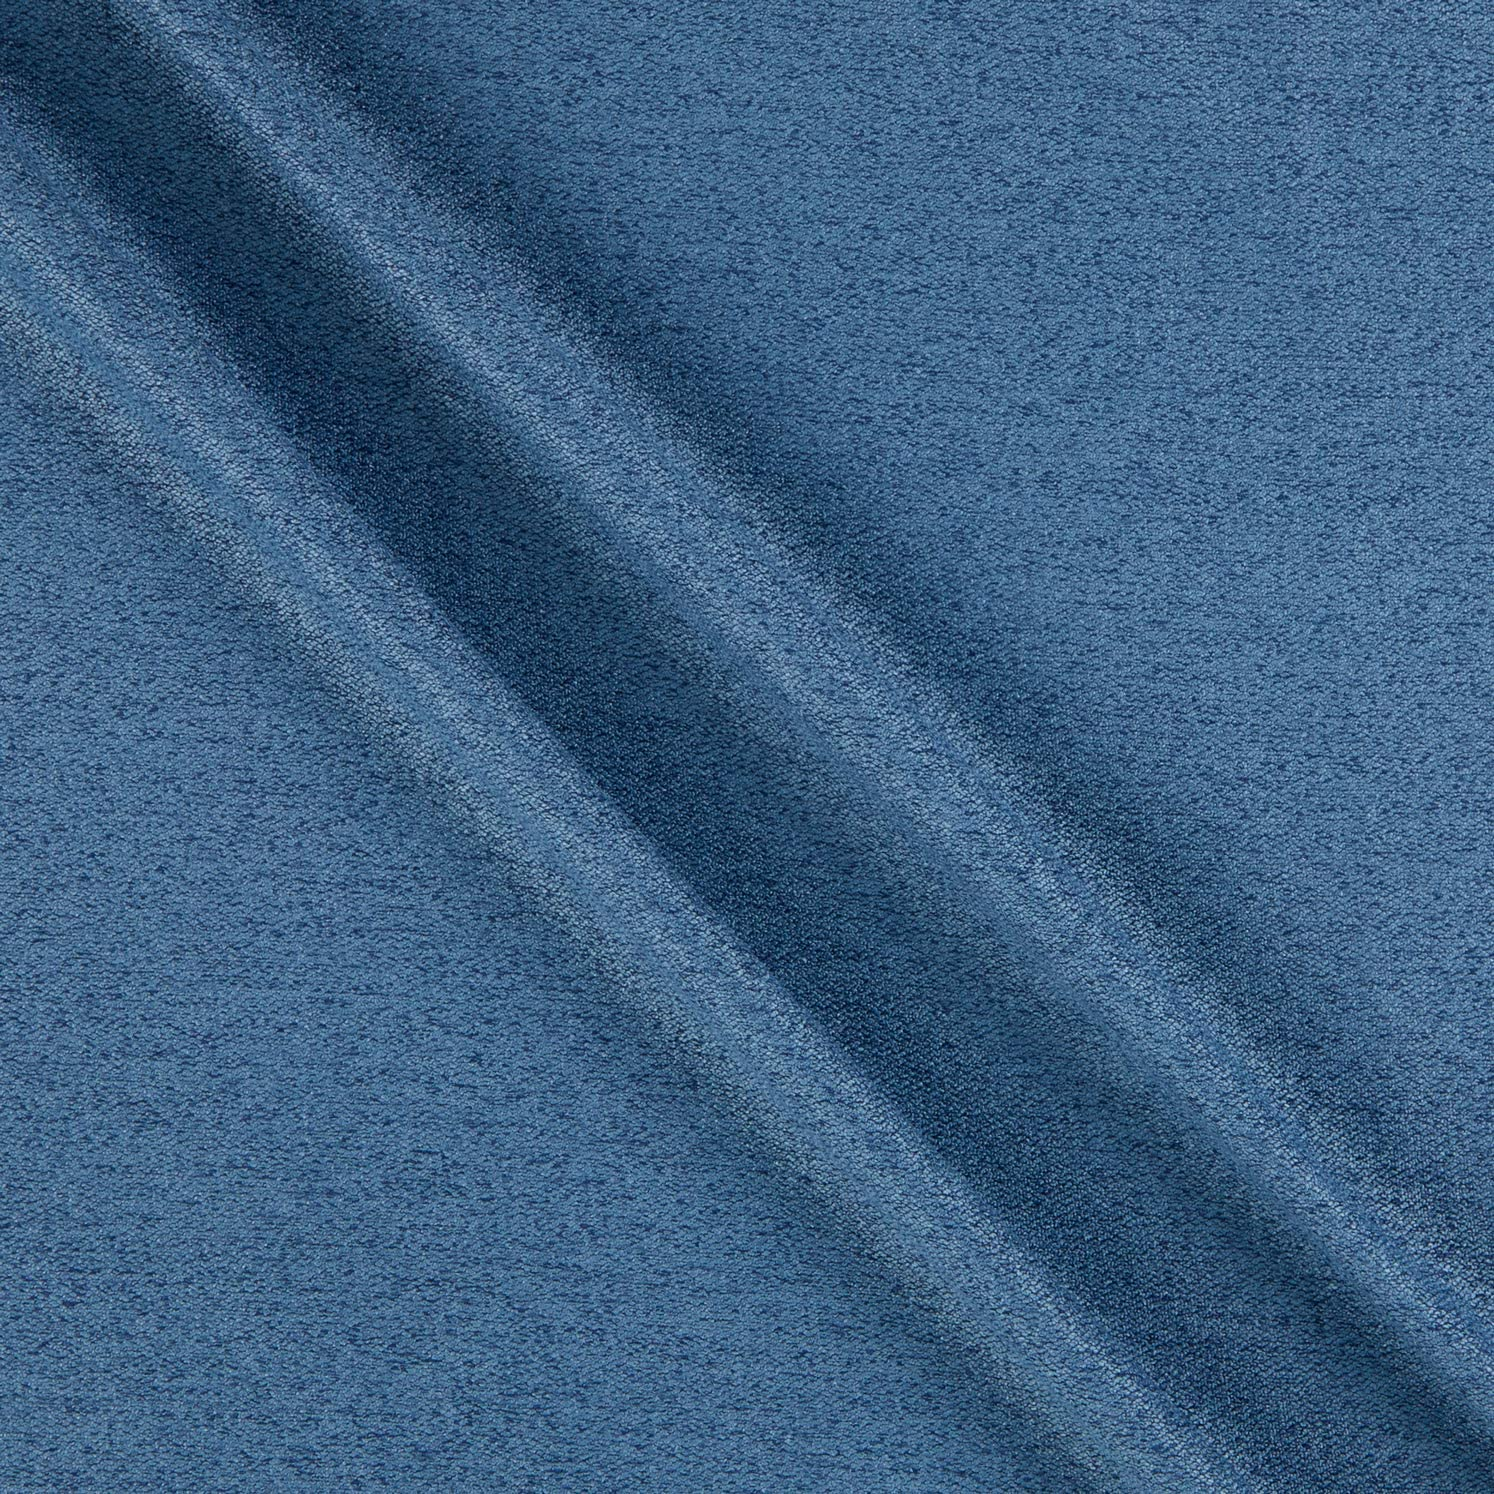 Richloom Fabrics Richloom Solarium Outdoor Cortona Pacific Fabric by The Yard